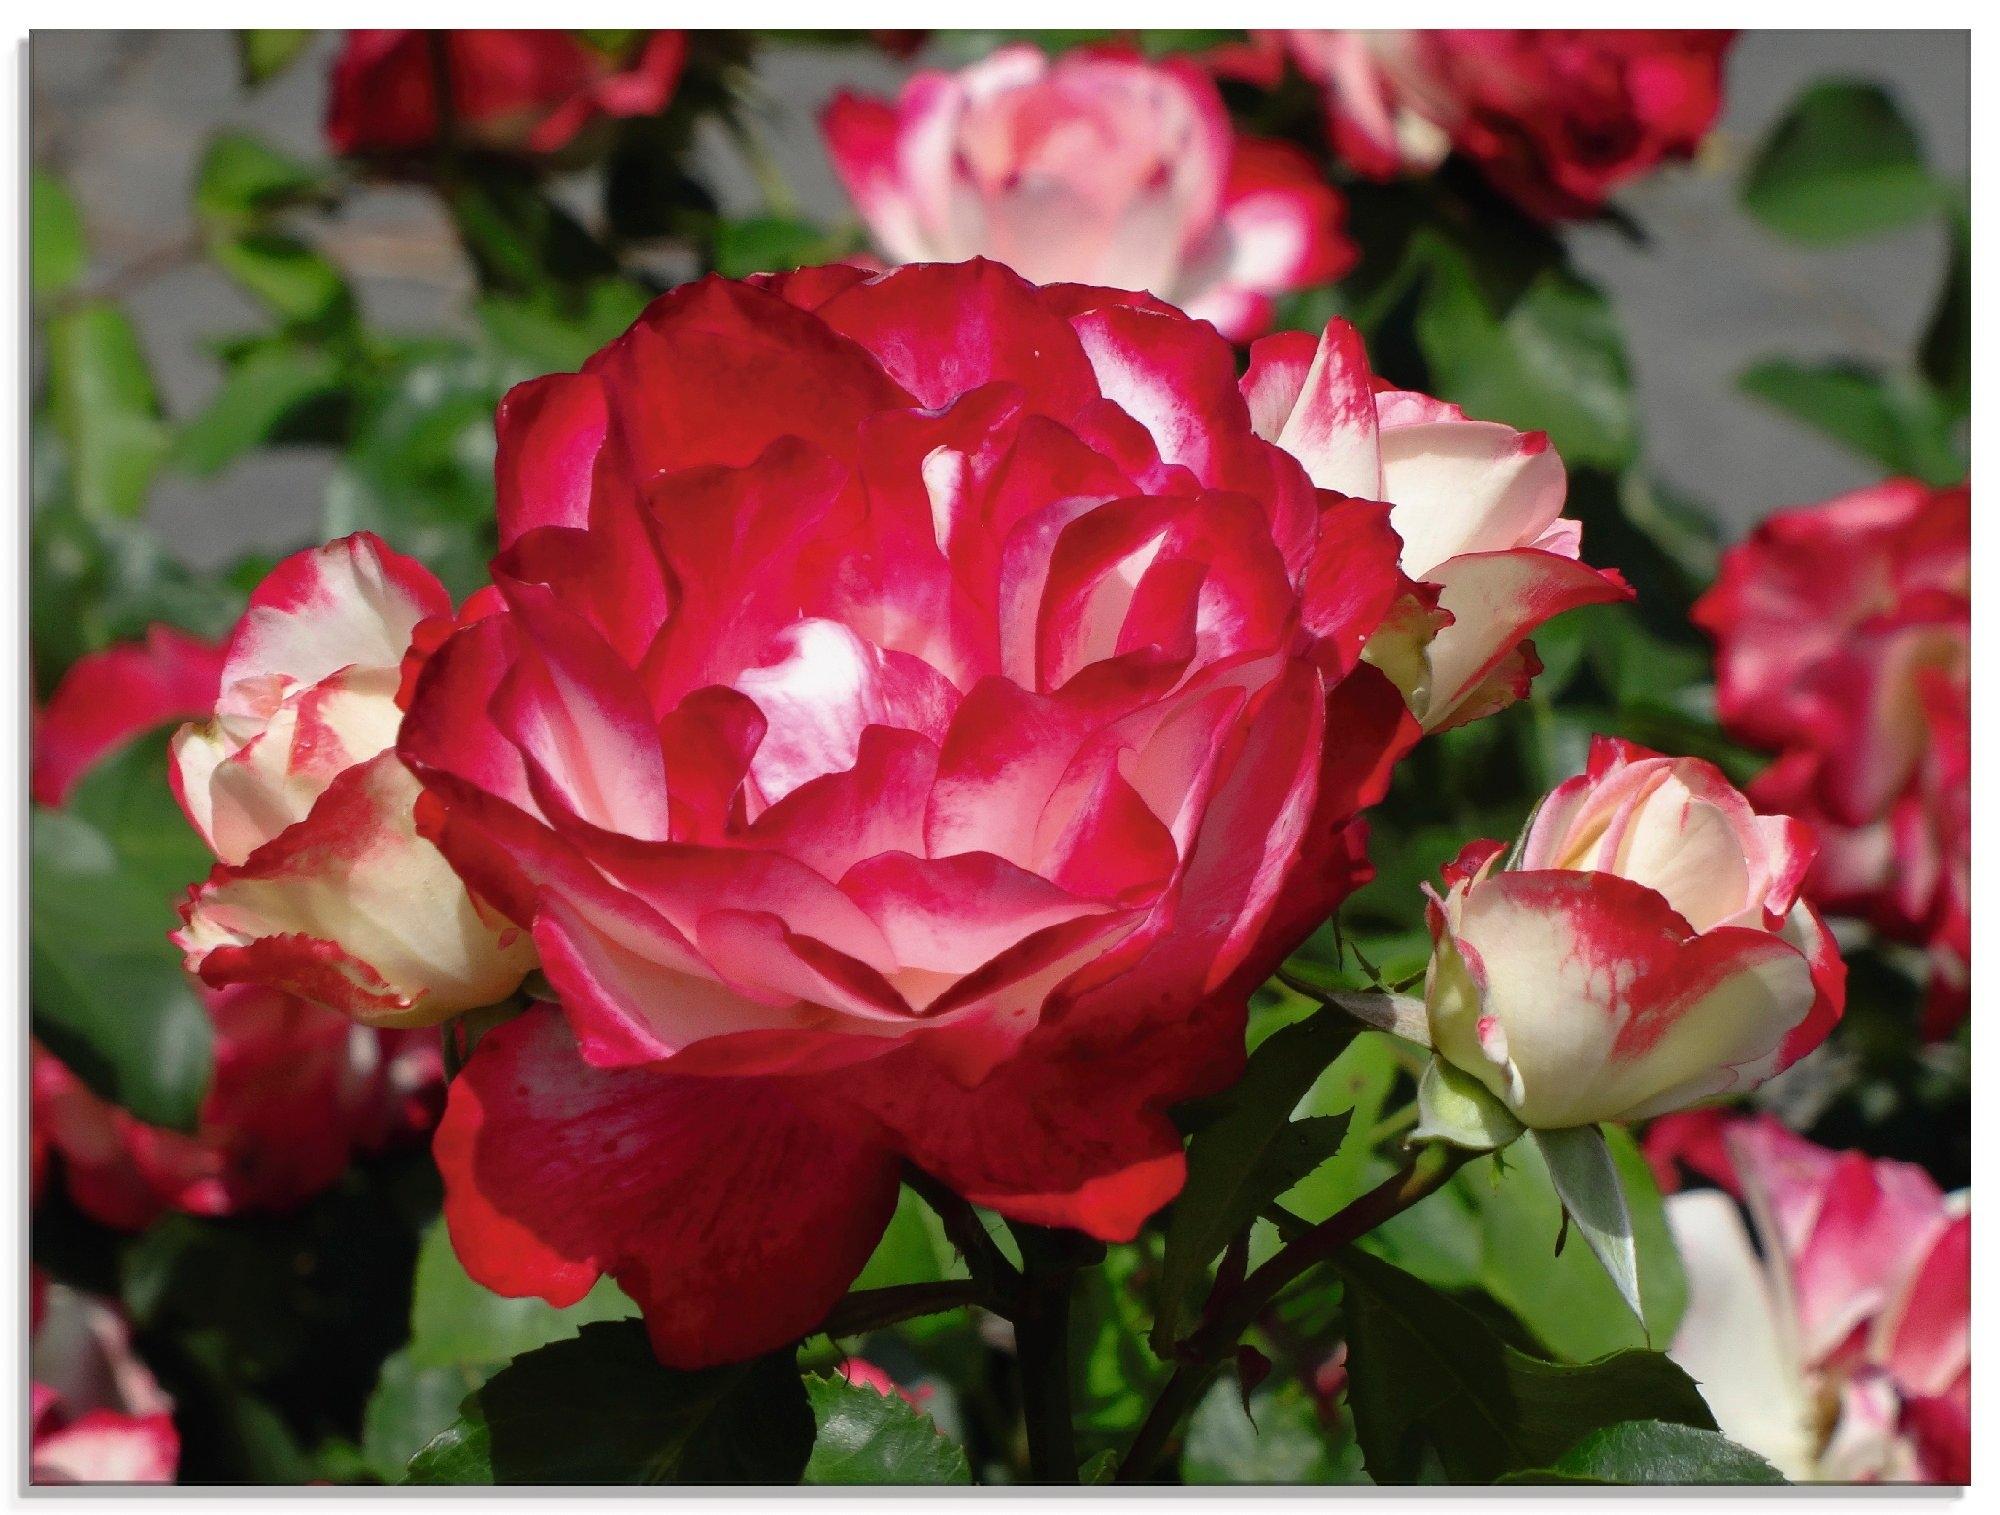 Artland print op glas Rood witte roos (1 stuk) voordelig en veilig online kopen